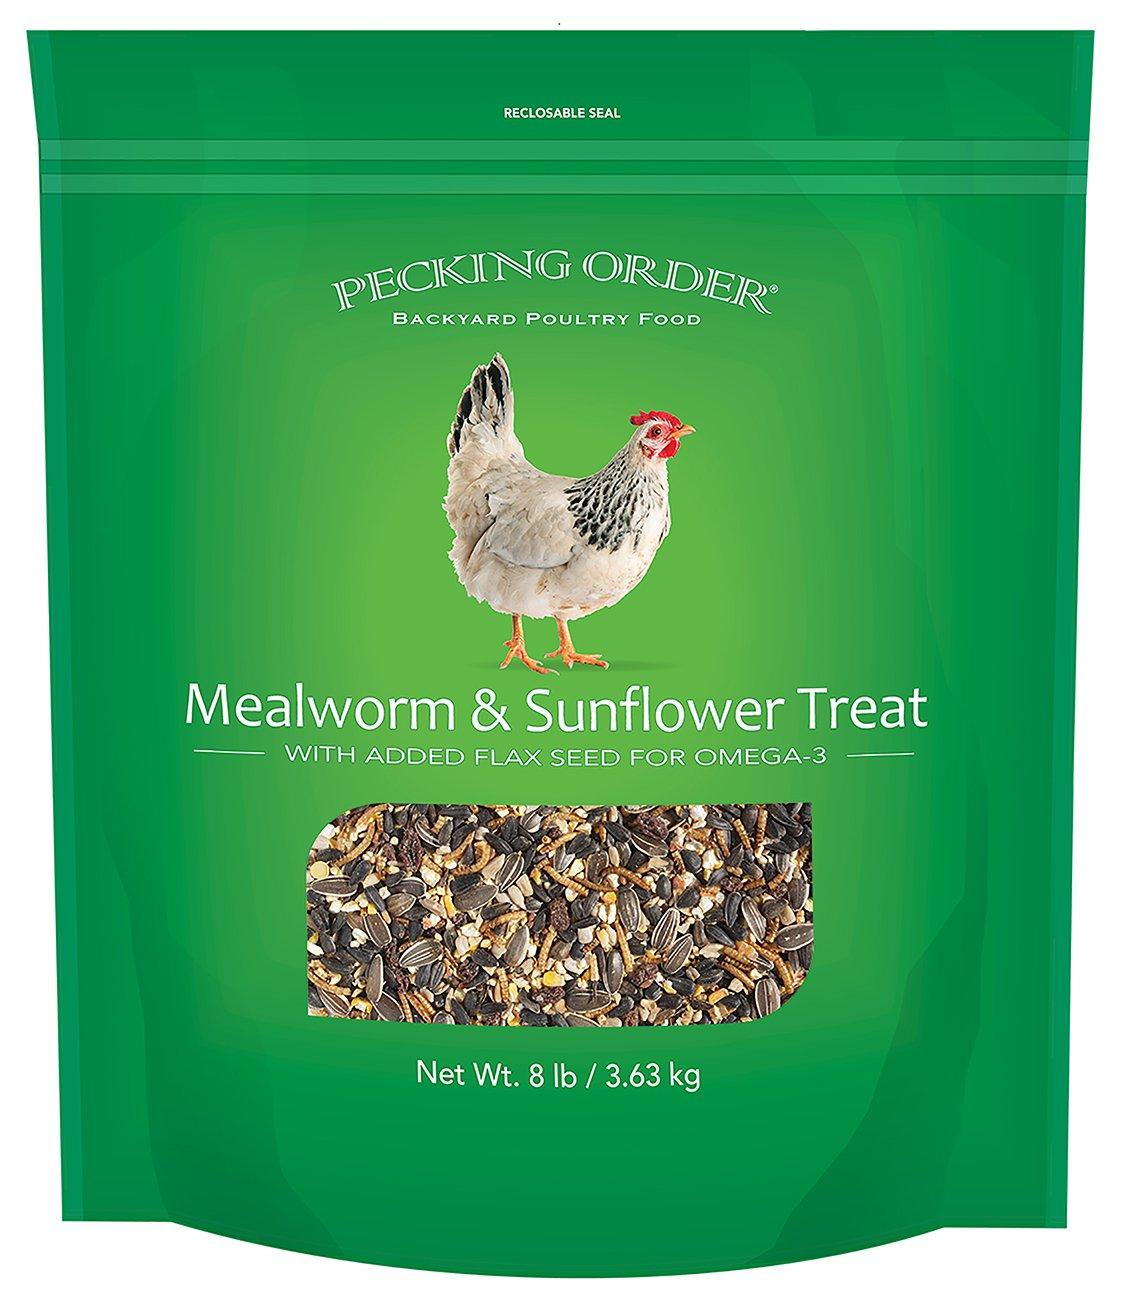 Pecking Order Mealworm & Sunflower Treat, 8 lb